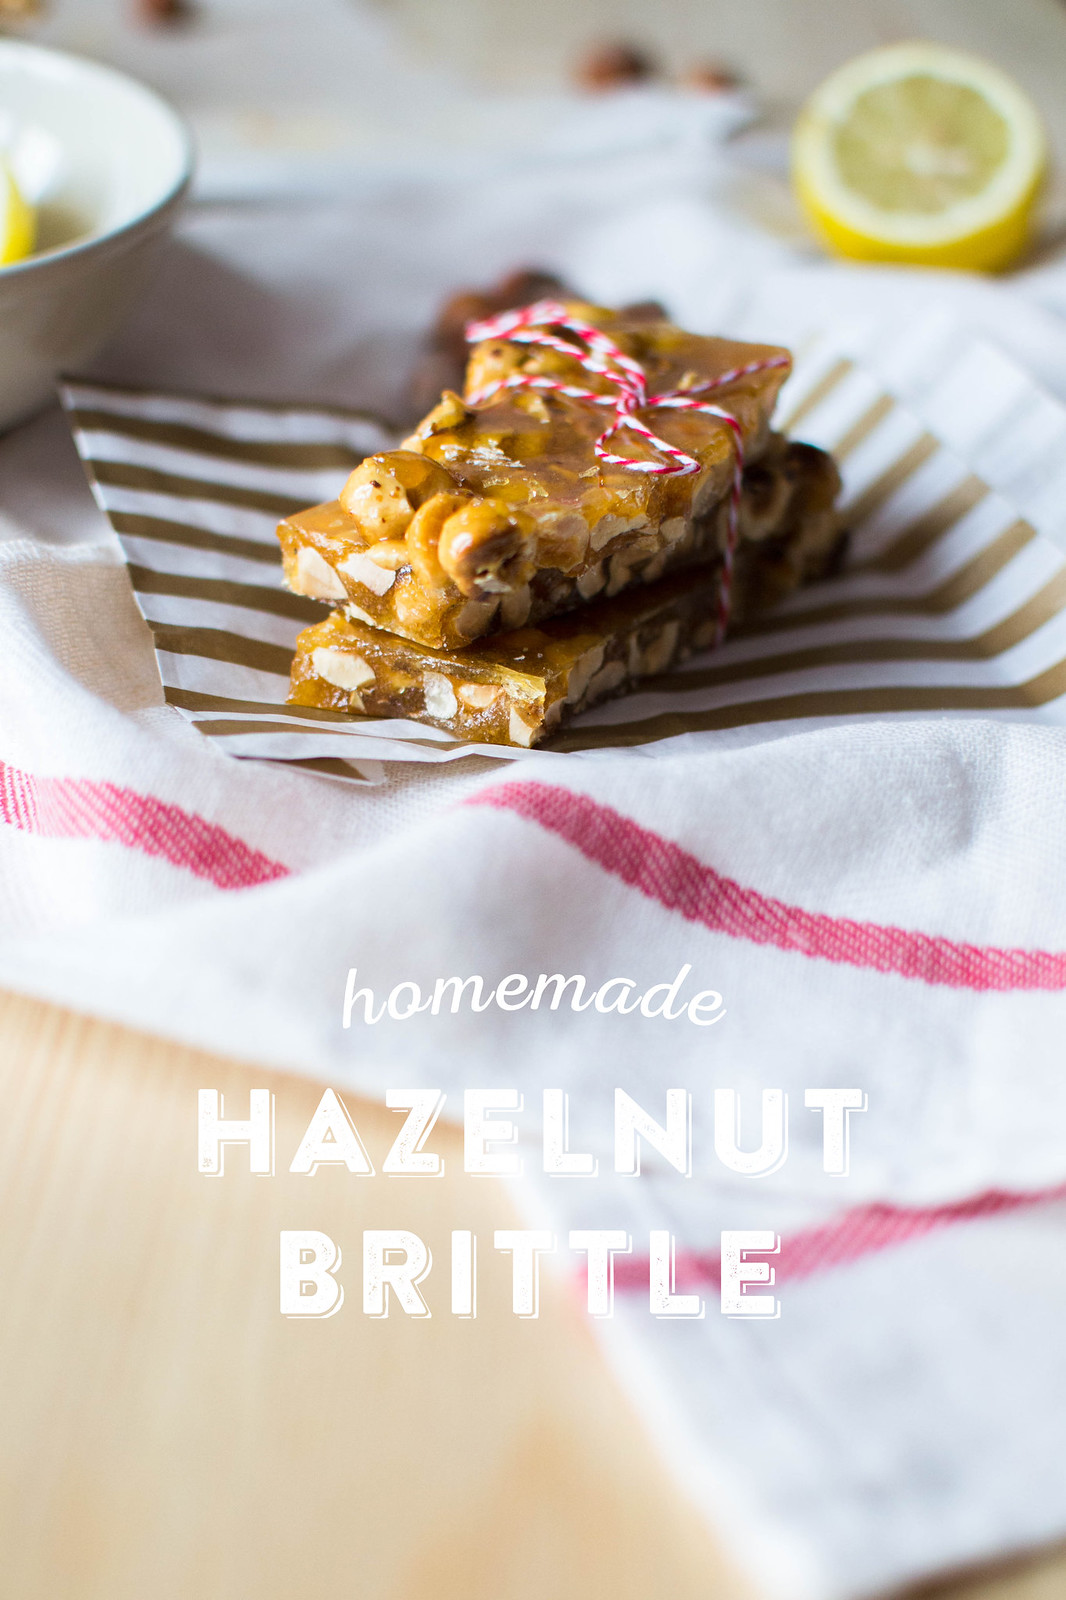 Homemade Hazelnut Brittle